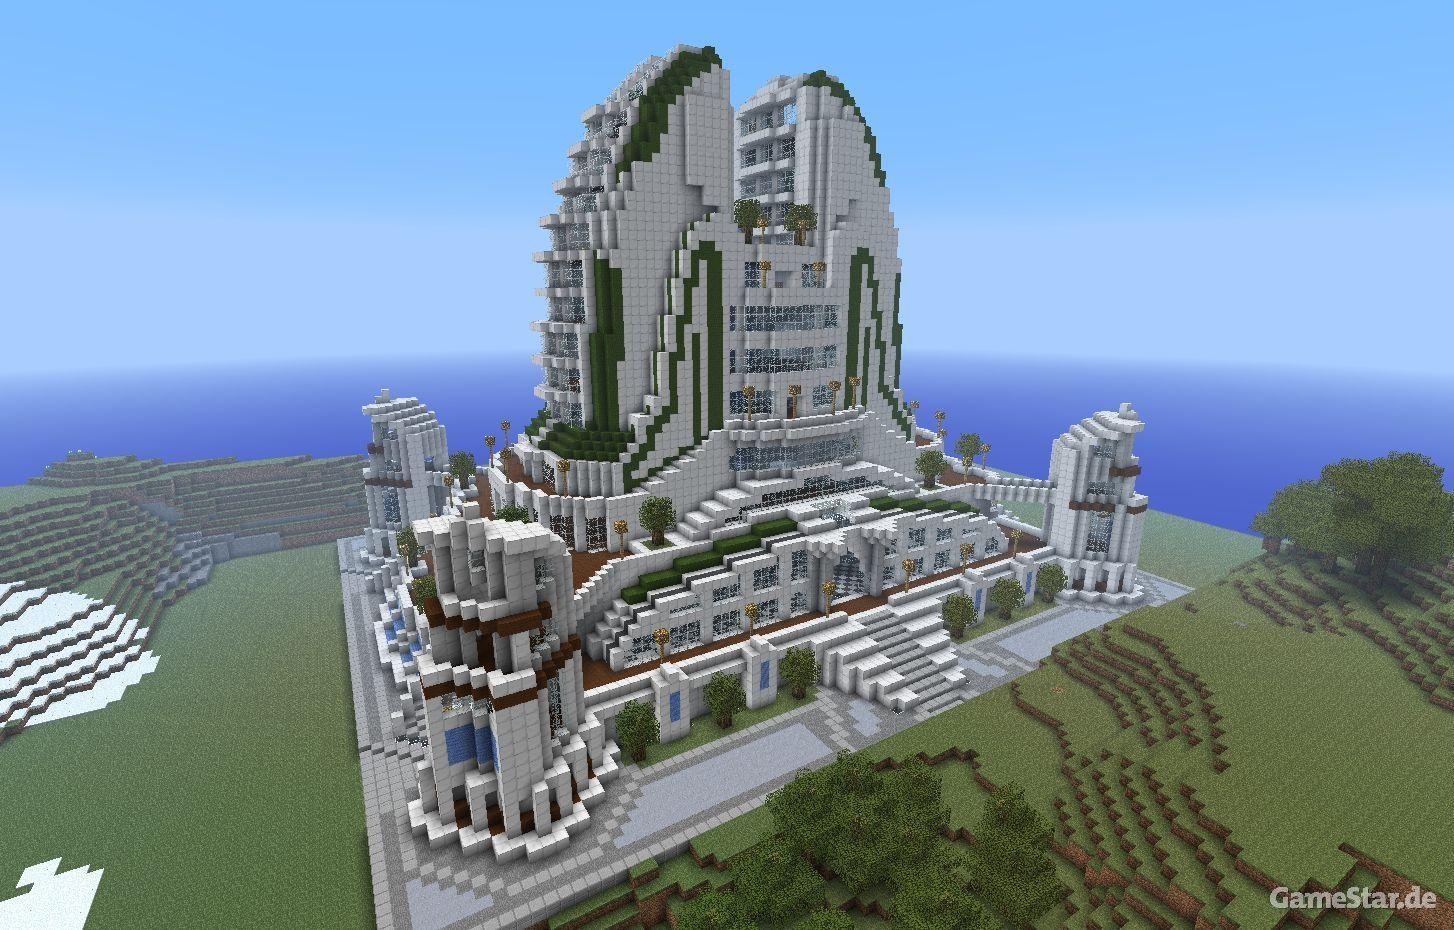 beautiful minecraft builds - Google Search | Games: I enjoy